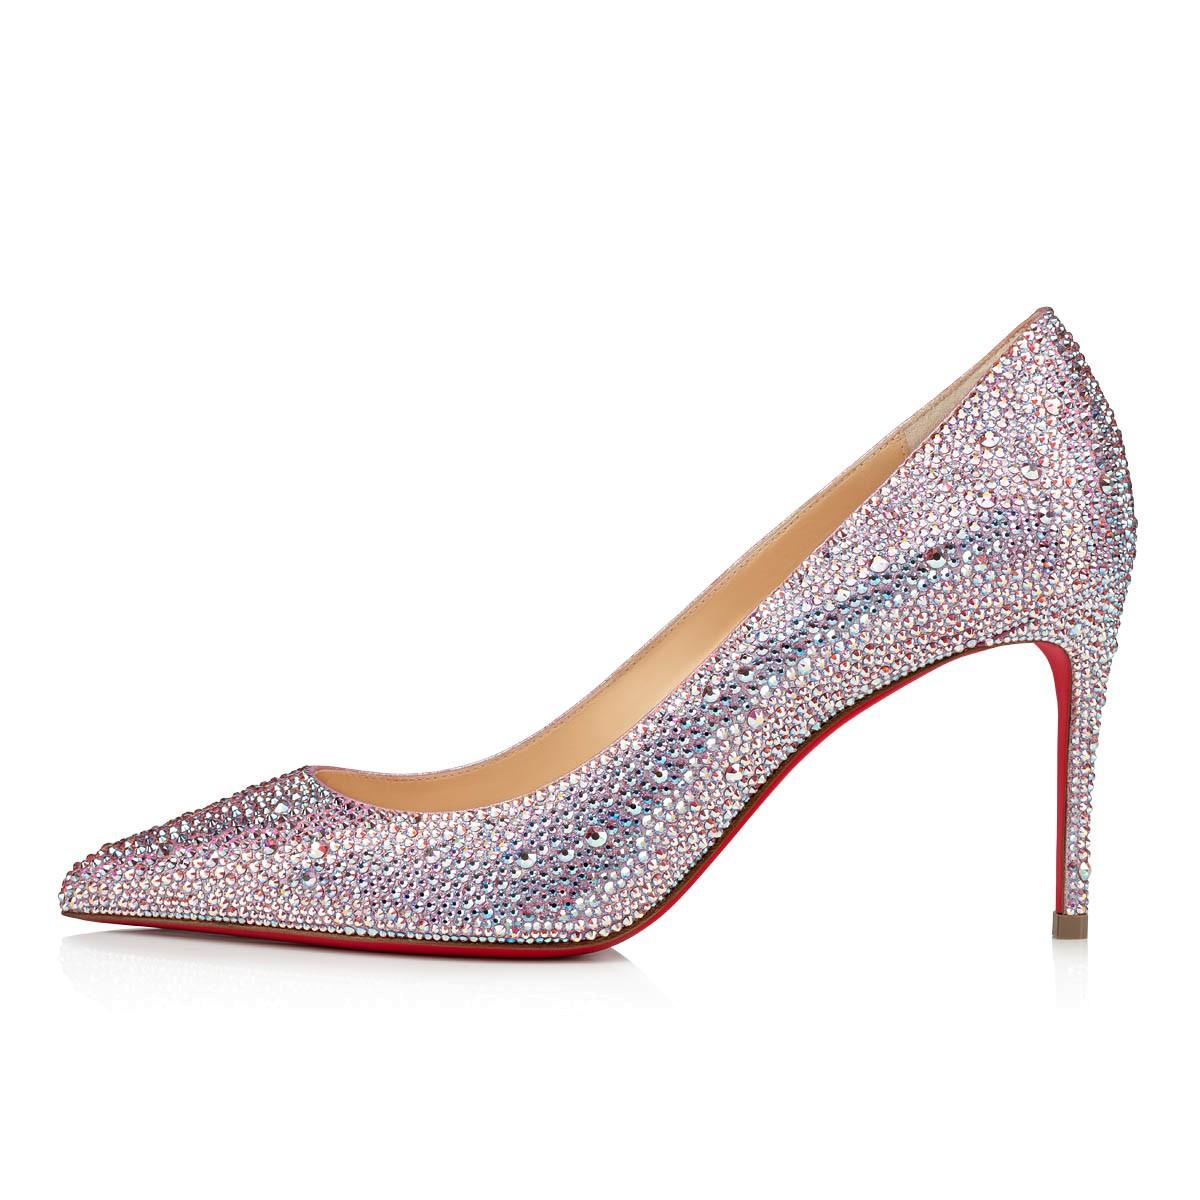 Women Shoes - Kate Strass - Christian Louboutin